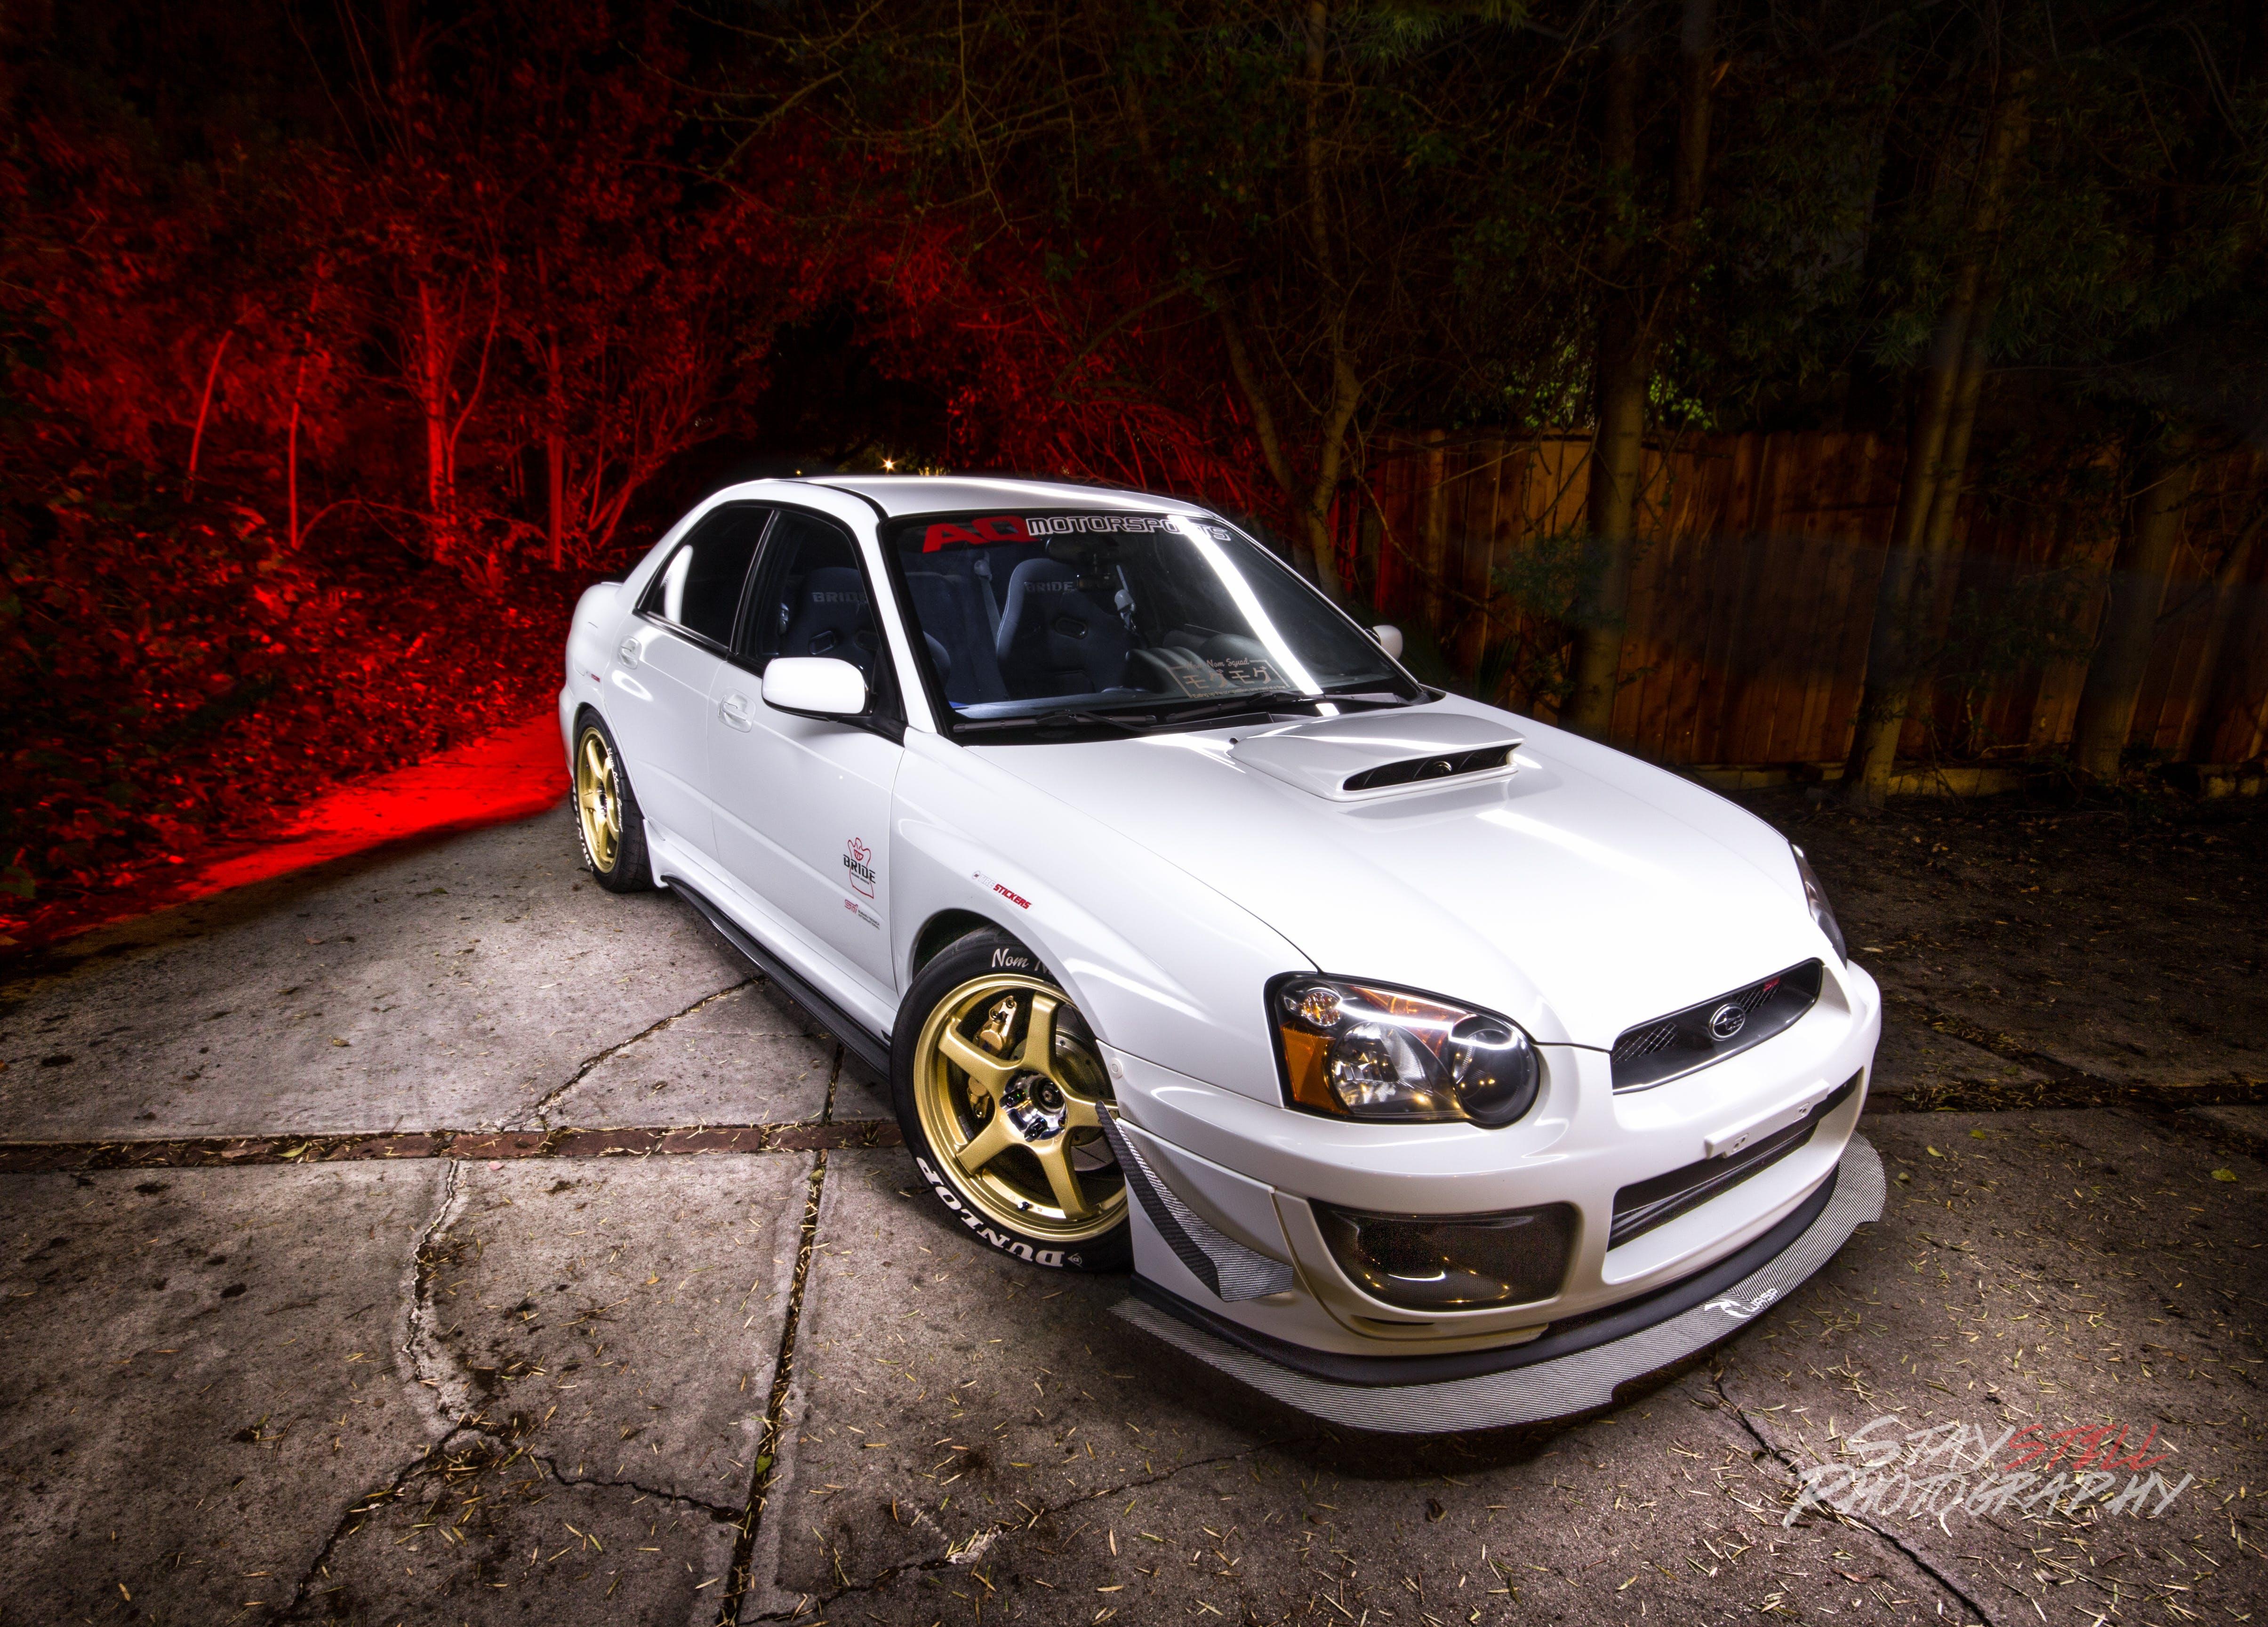 Free stock photo of automotive, car, cars, Impreza